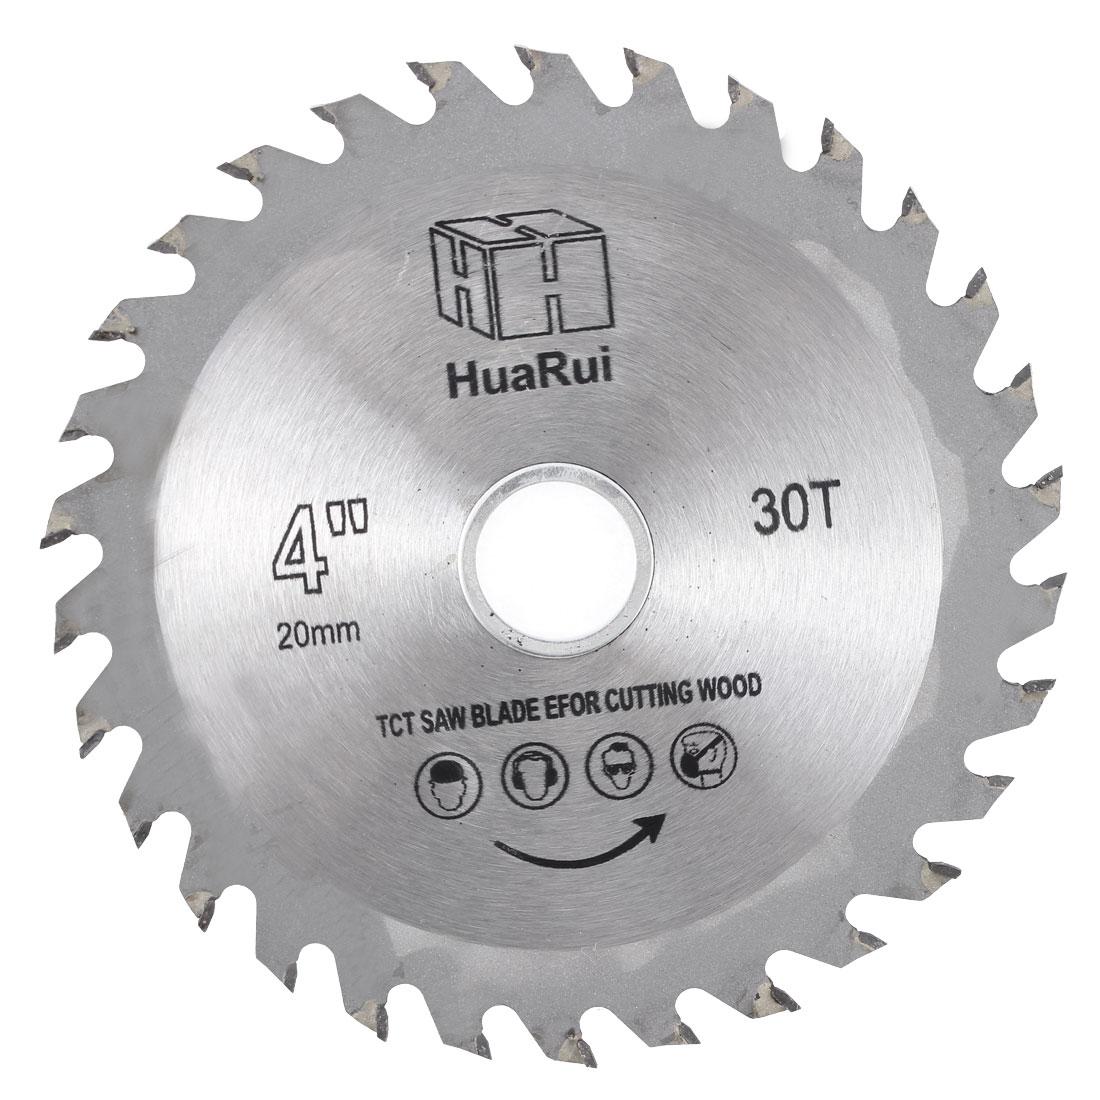 110mmx20mmx1mm 30 Tooth Circular Cutting Saw Cutter Hand Tool